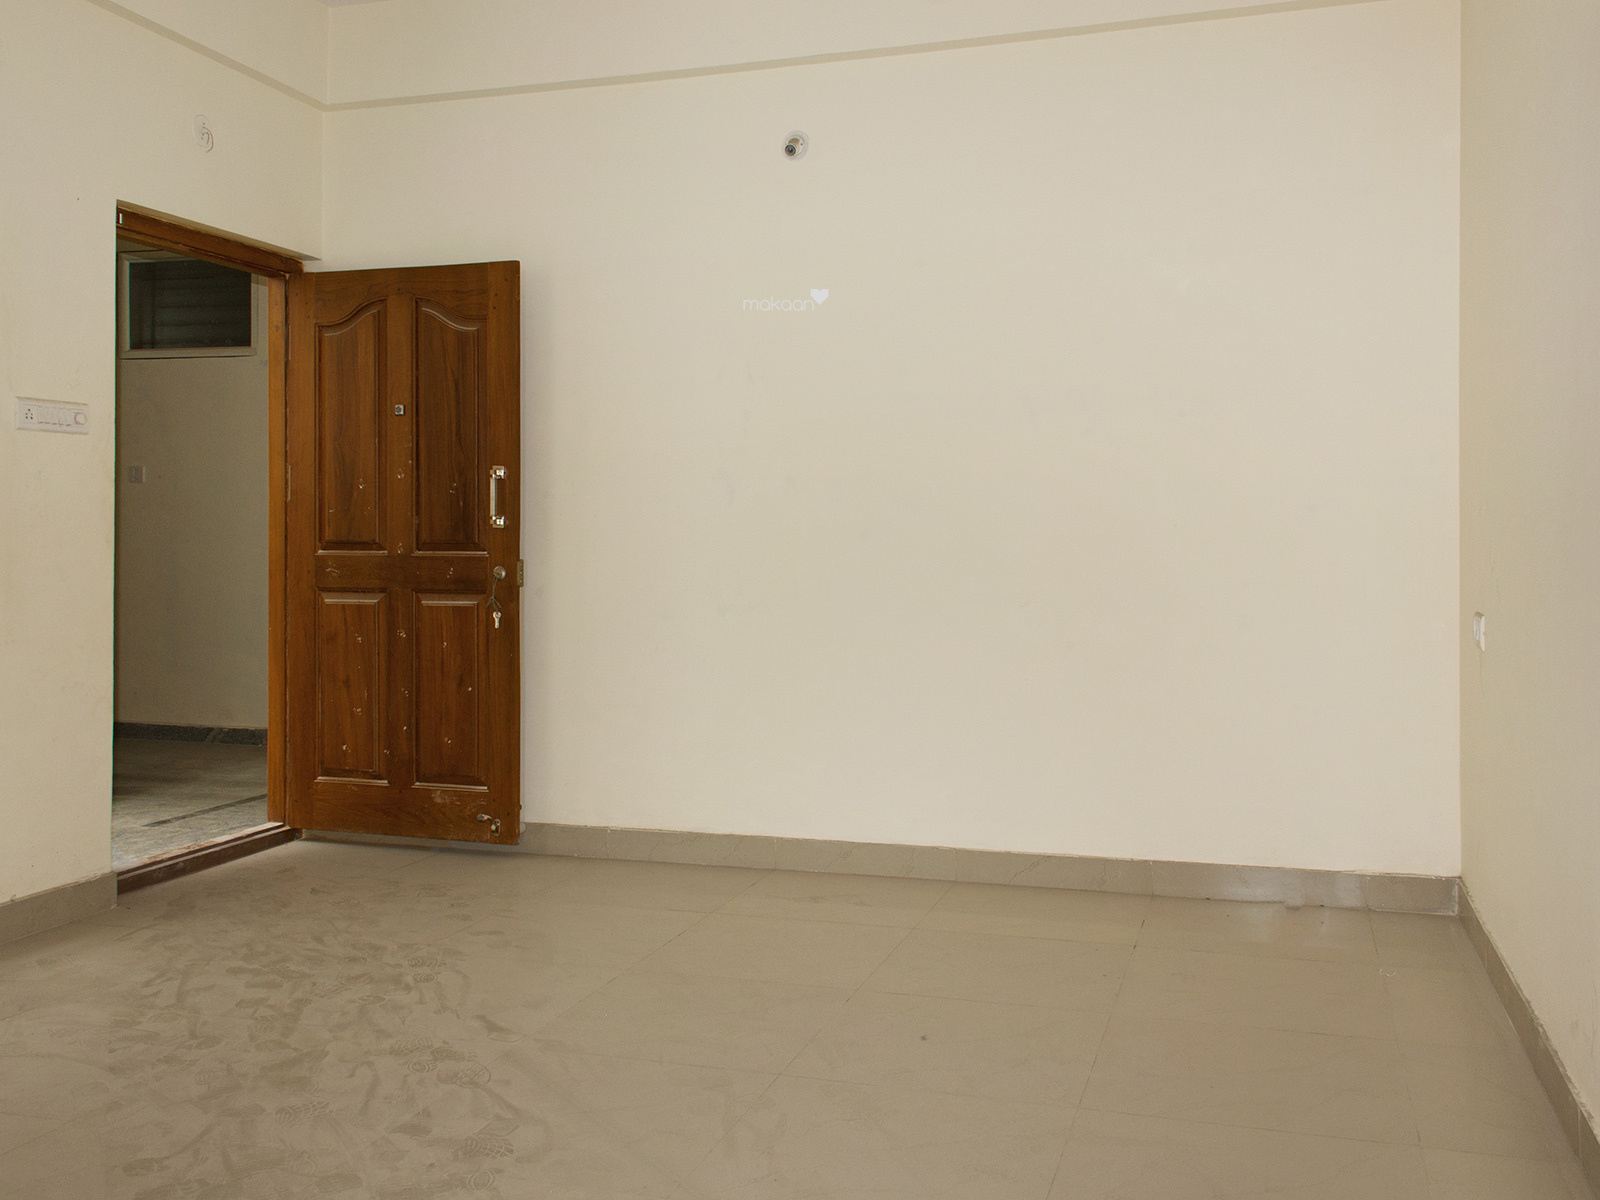 1076 sq ft 2BHK 2BHK+2T (1,076 sq ft) Property By Proptiger In Arcade, Vijay Nagar